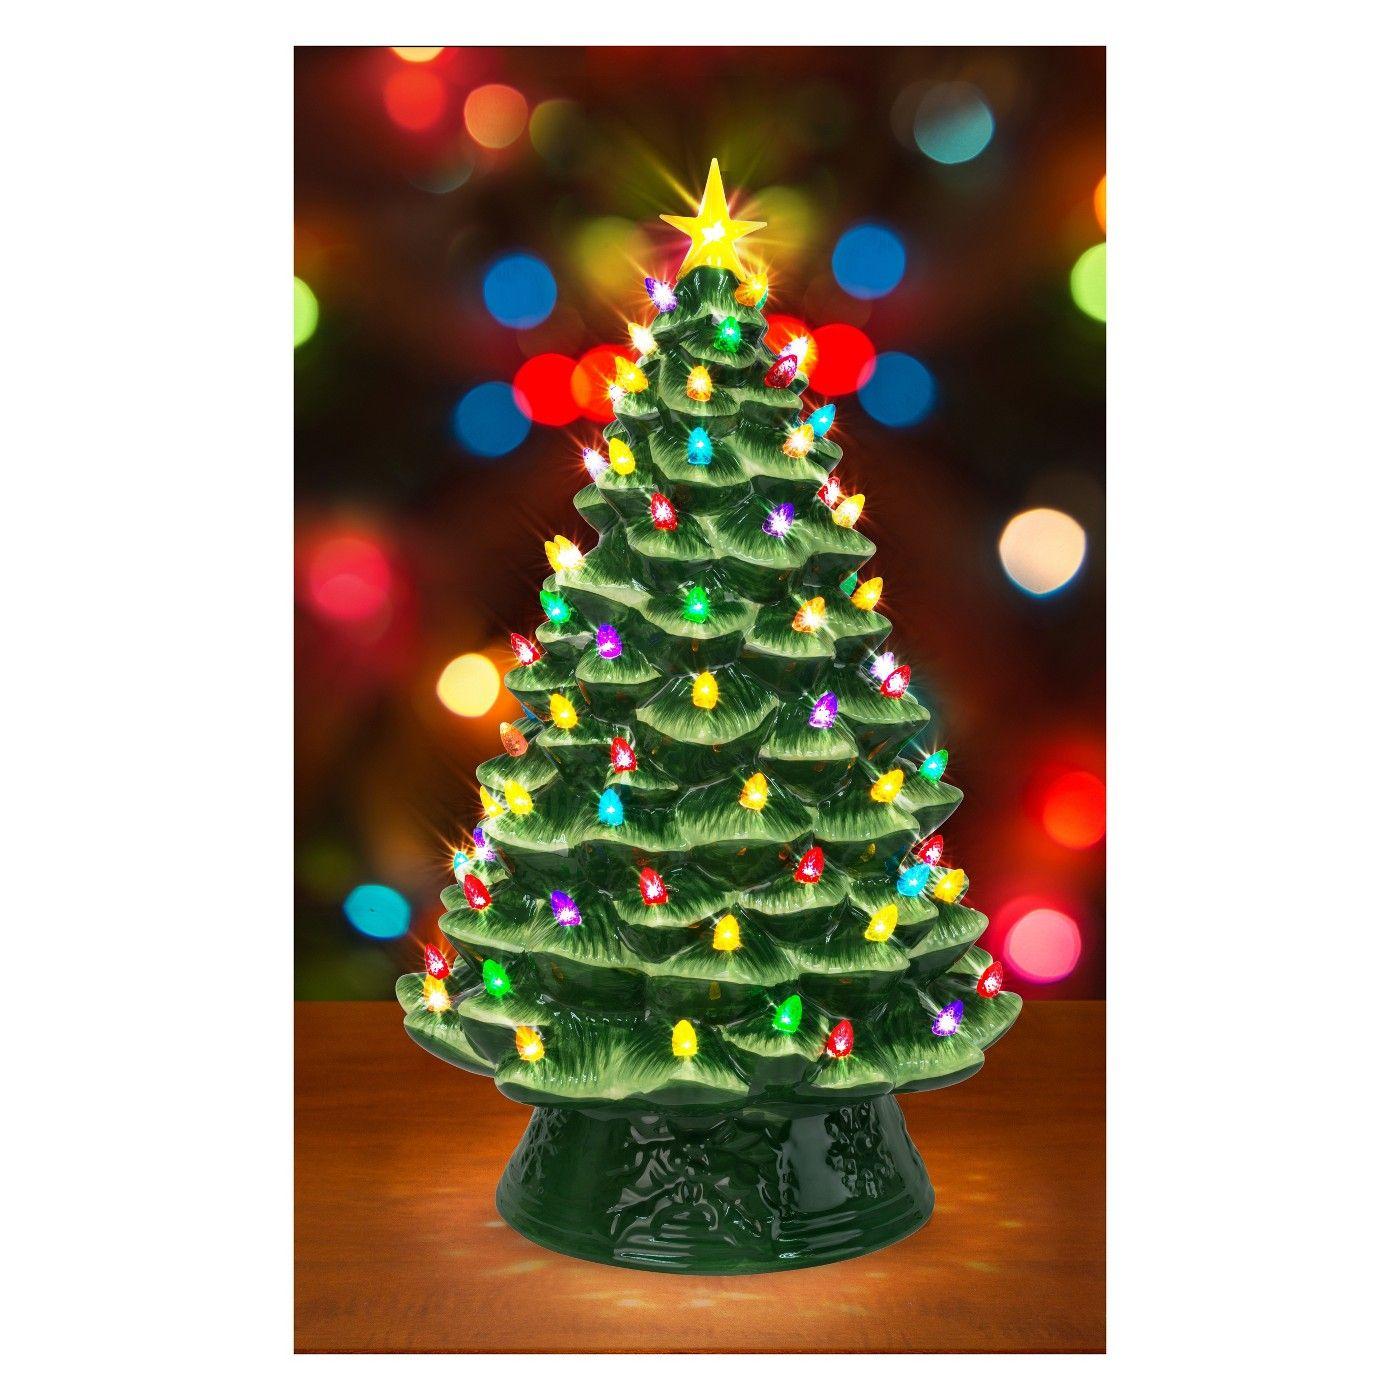 Mr Christmas Ceramic Christmas Tree Green Wondershop Afflink